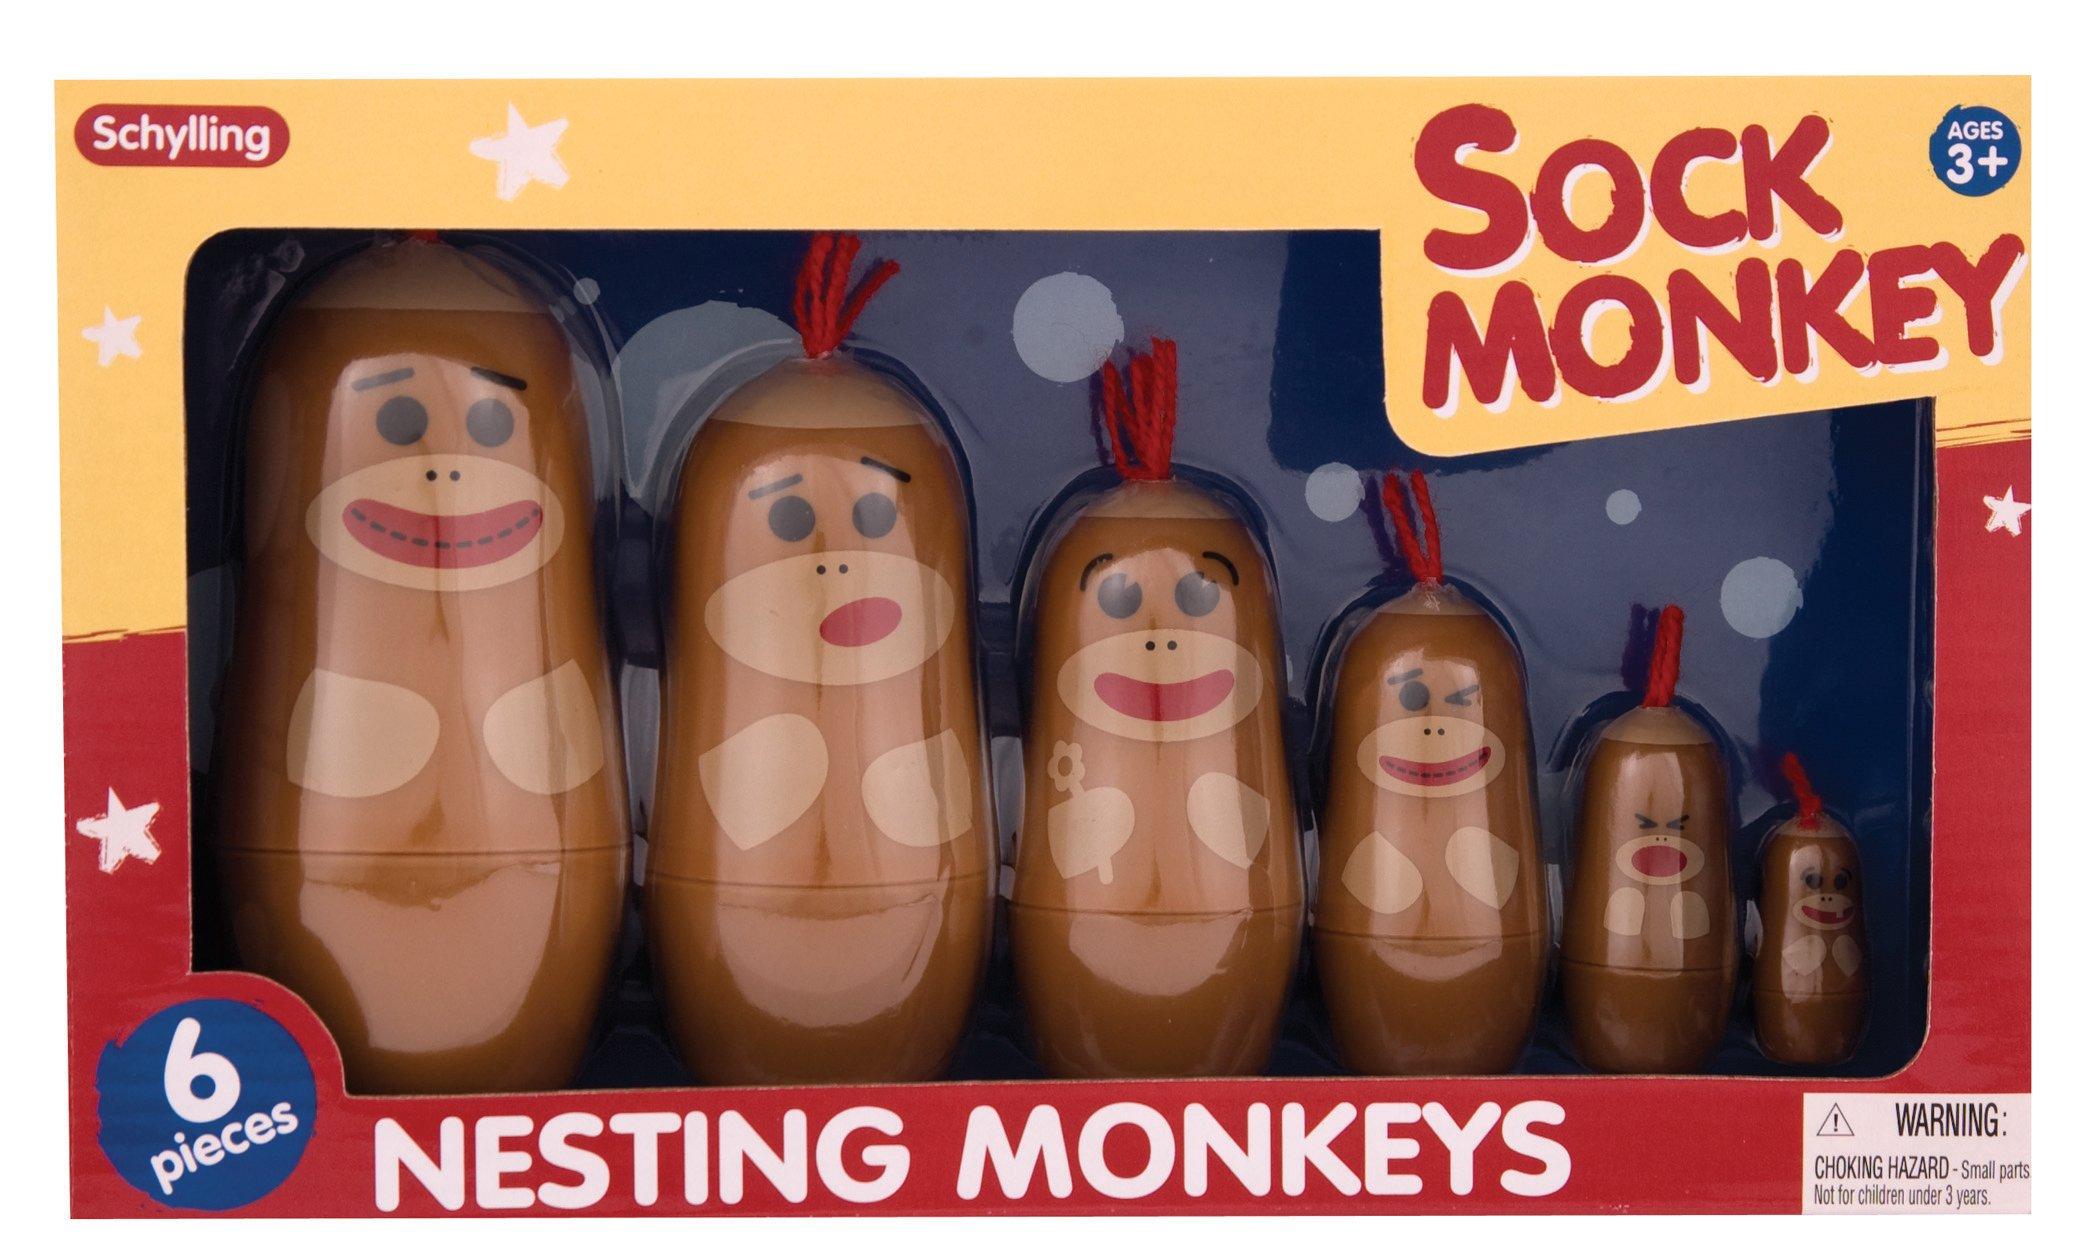 Schylling Sock Monkey Nesting Monkeys by Schylling